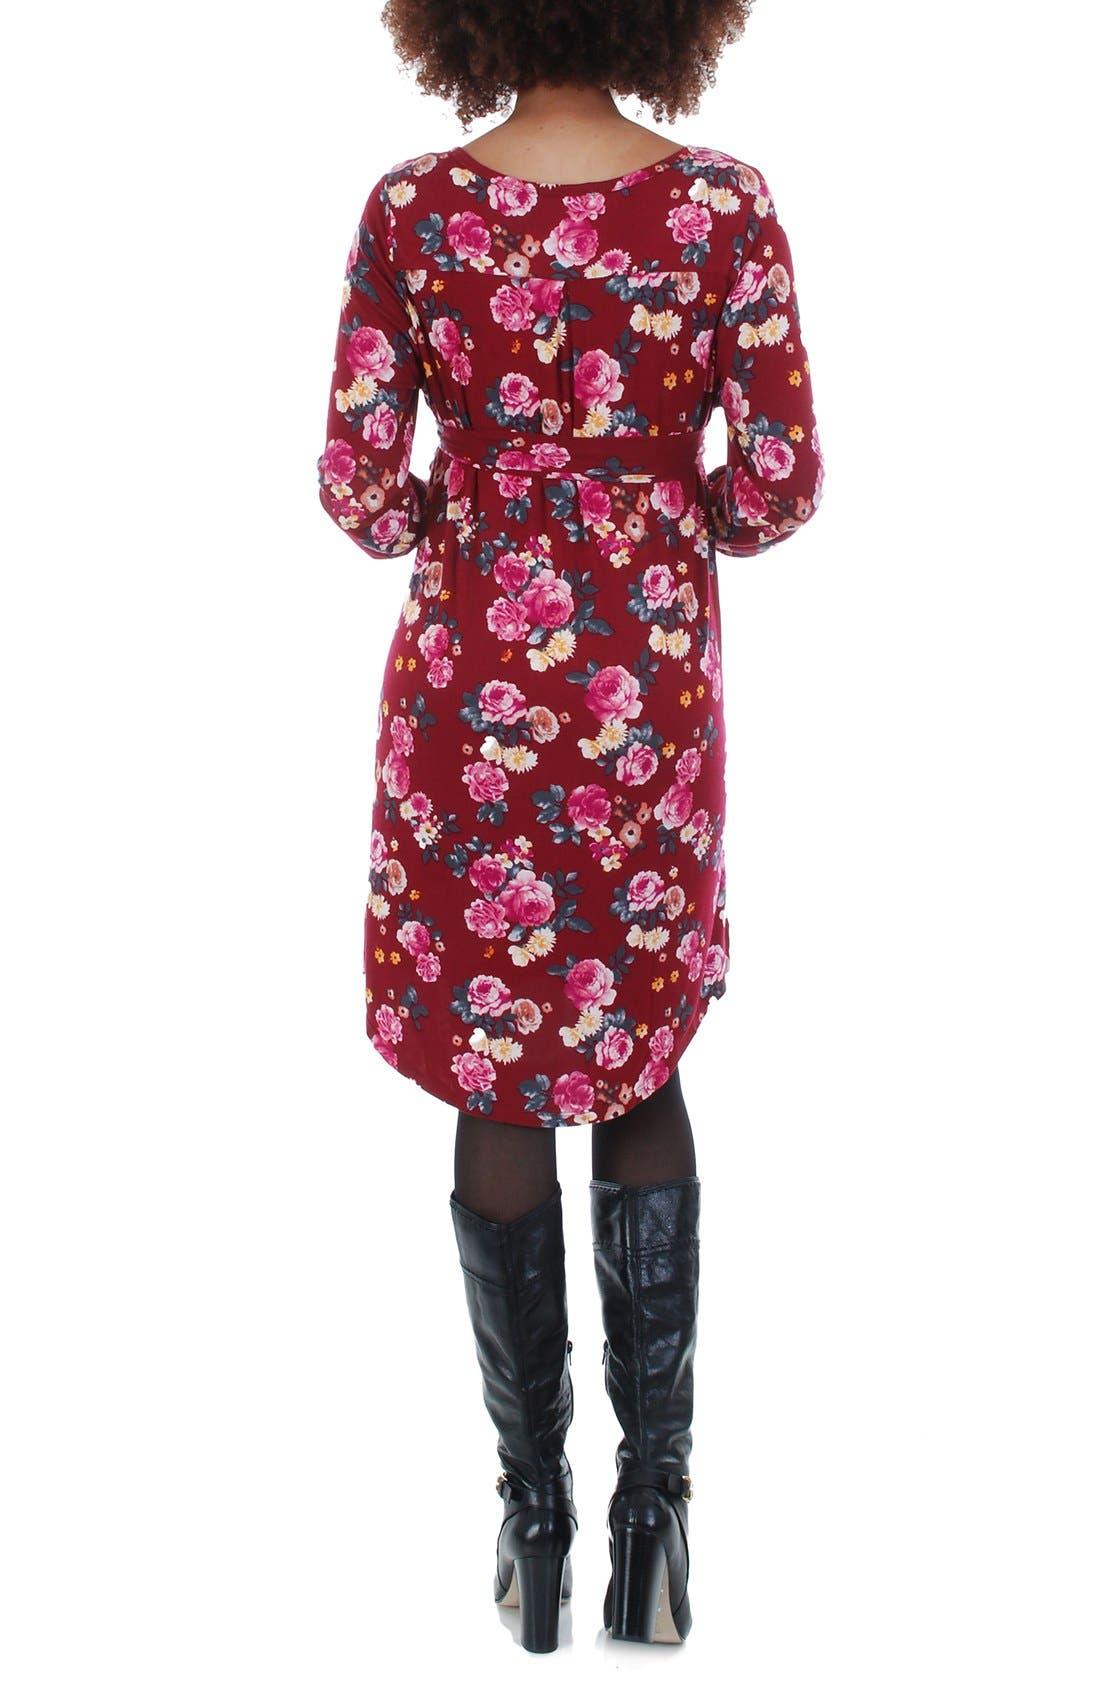 Lonni Maternity/Nursing Shirtdress,                             Alternate thumbnail 5, color,                             BURGUNDY FLORAL